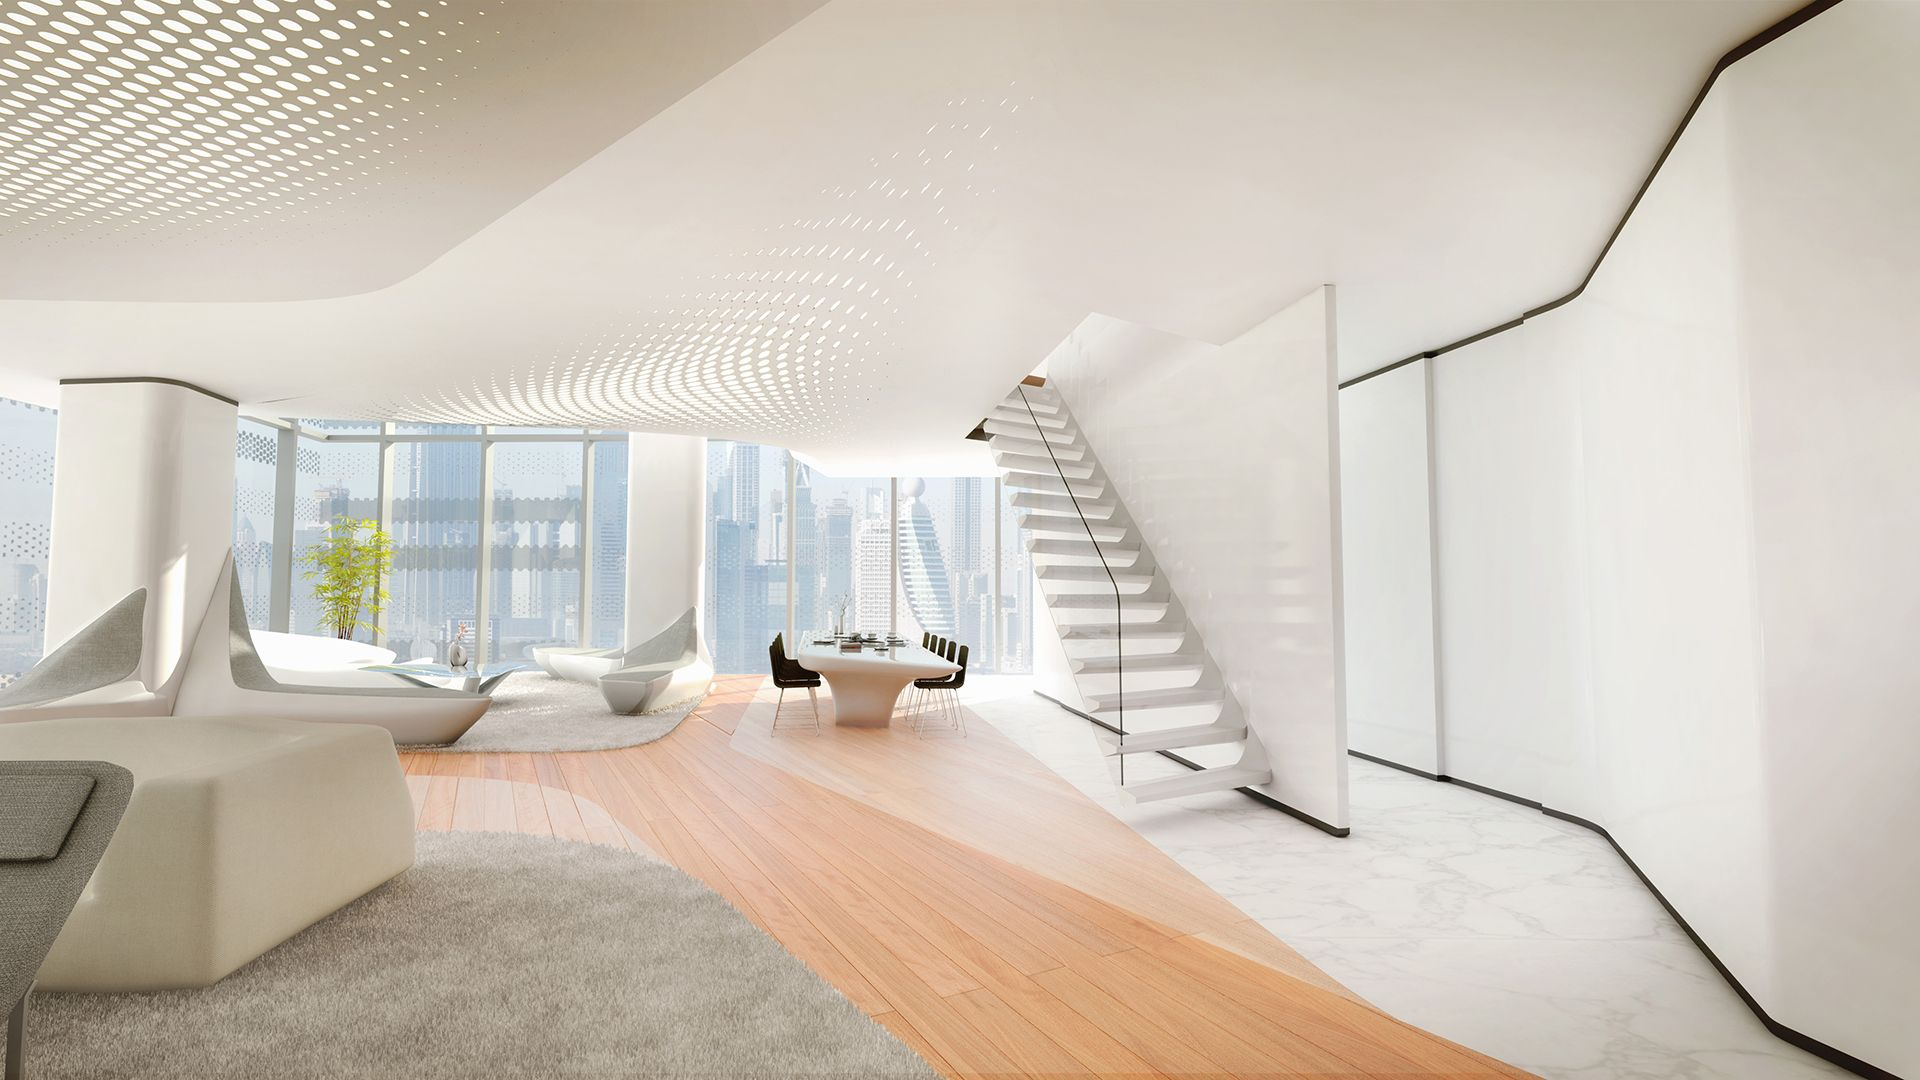 zaha hadid designs interiors for dubai\'s opus office tower | Mockup ...